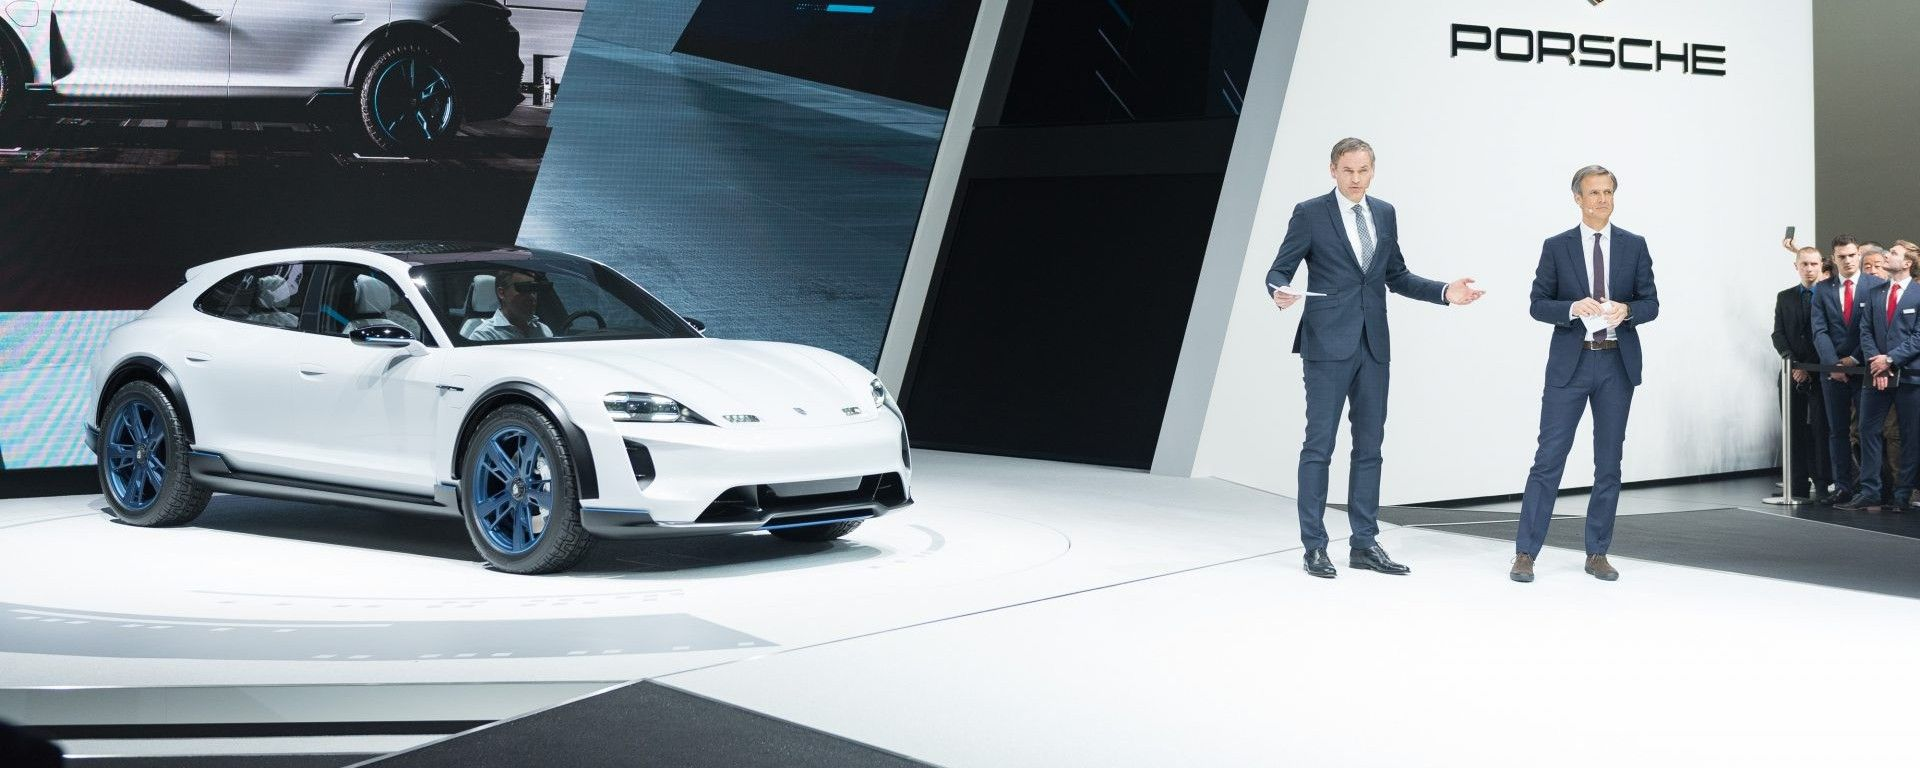 Nuova Porsche 911 GT3 RS, Live Salone di Ginevra 2018